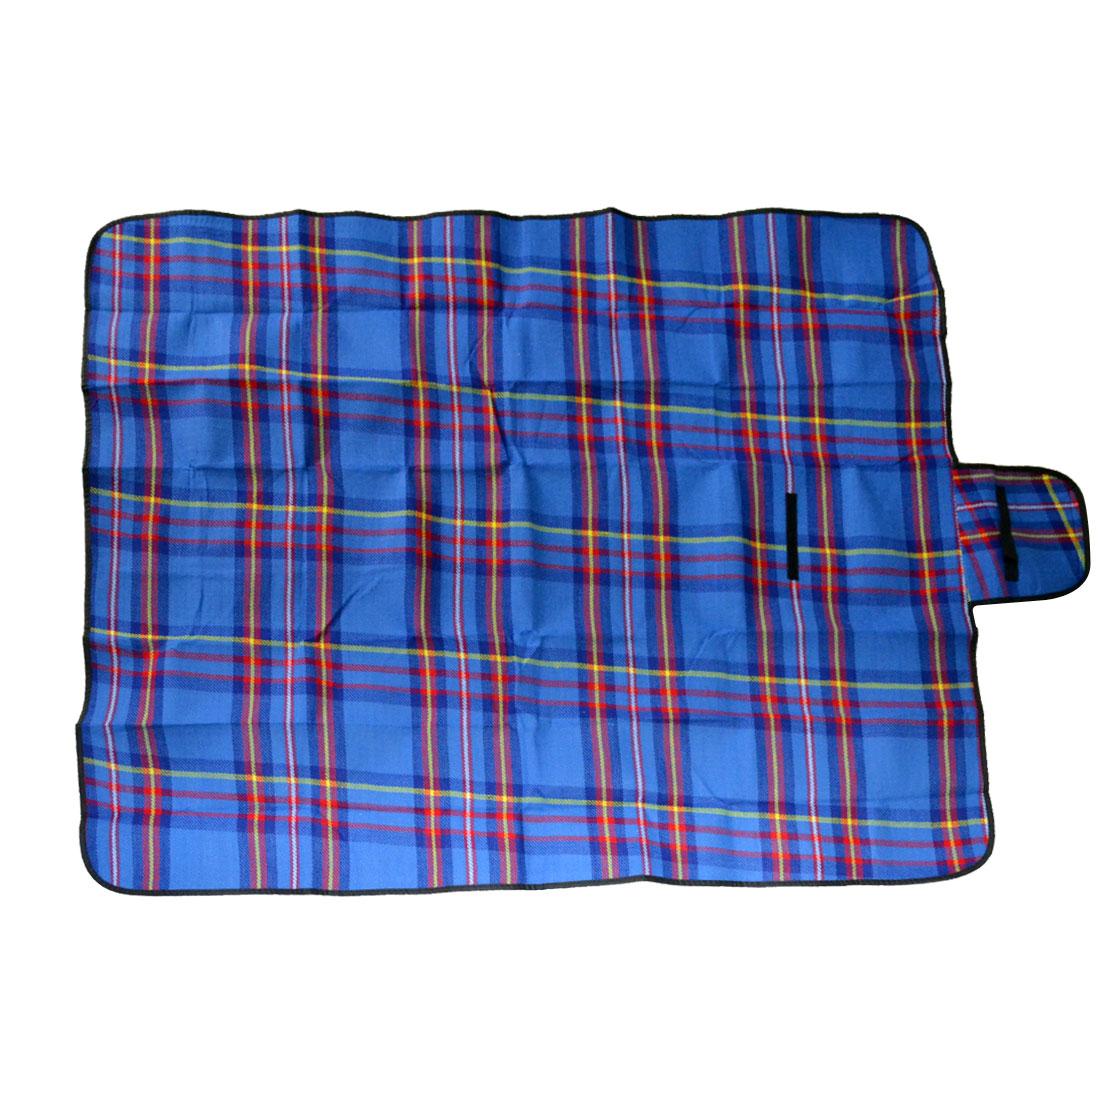 Grids Printed Waterproof Camping Picnic Mat Blanket Blue 150cm x 130cm